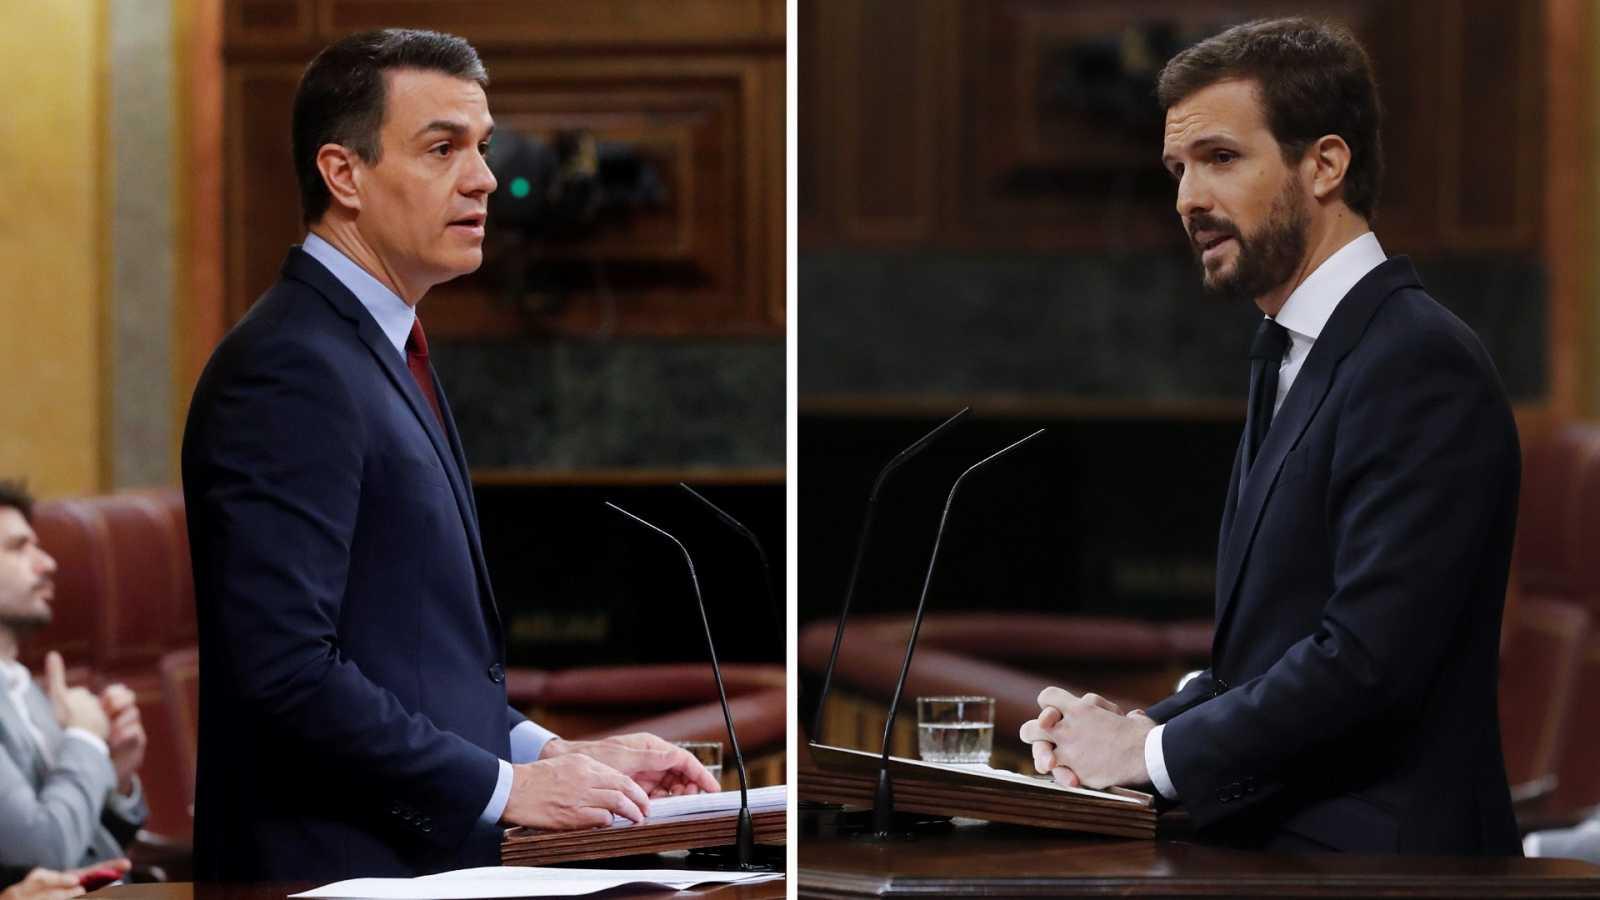 Telediario - 21 horas - 20/05/20 - RTVE.es